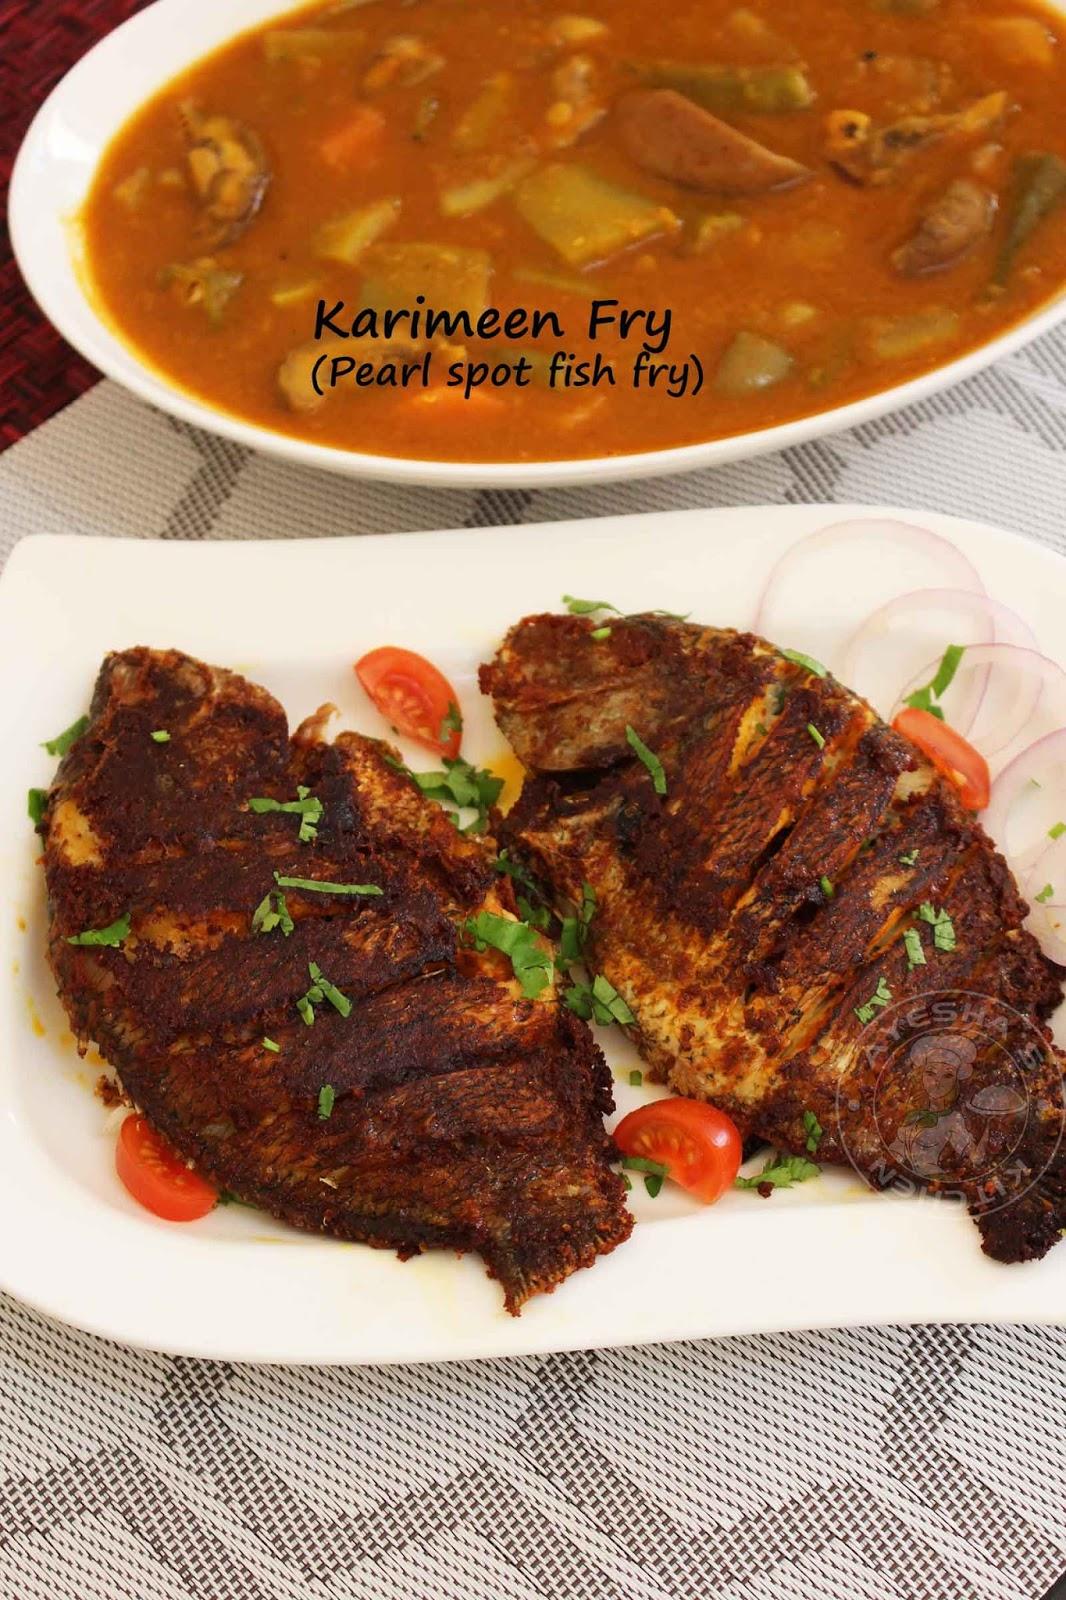 Fry fish recipe pearl spot karimeen fish fry for Cliffords fish fry